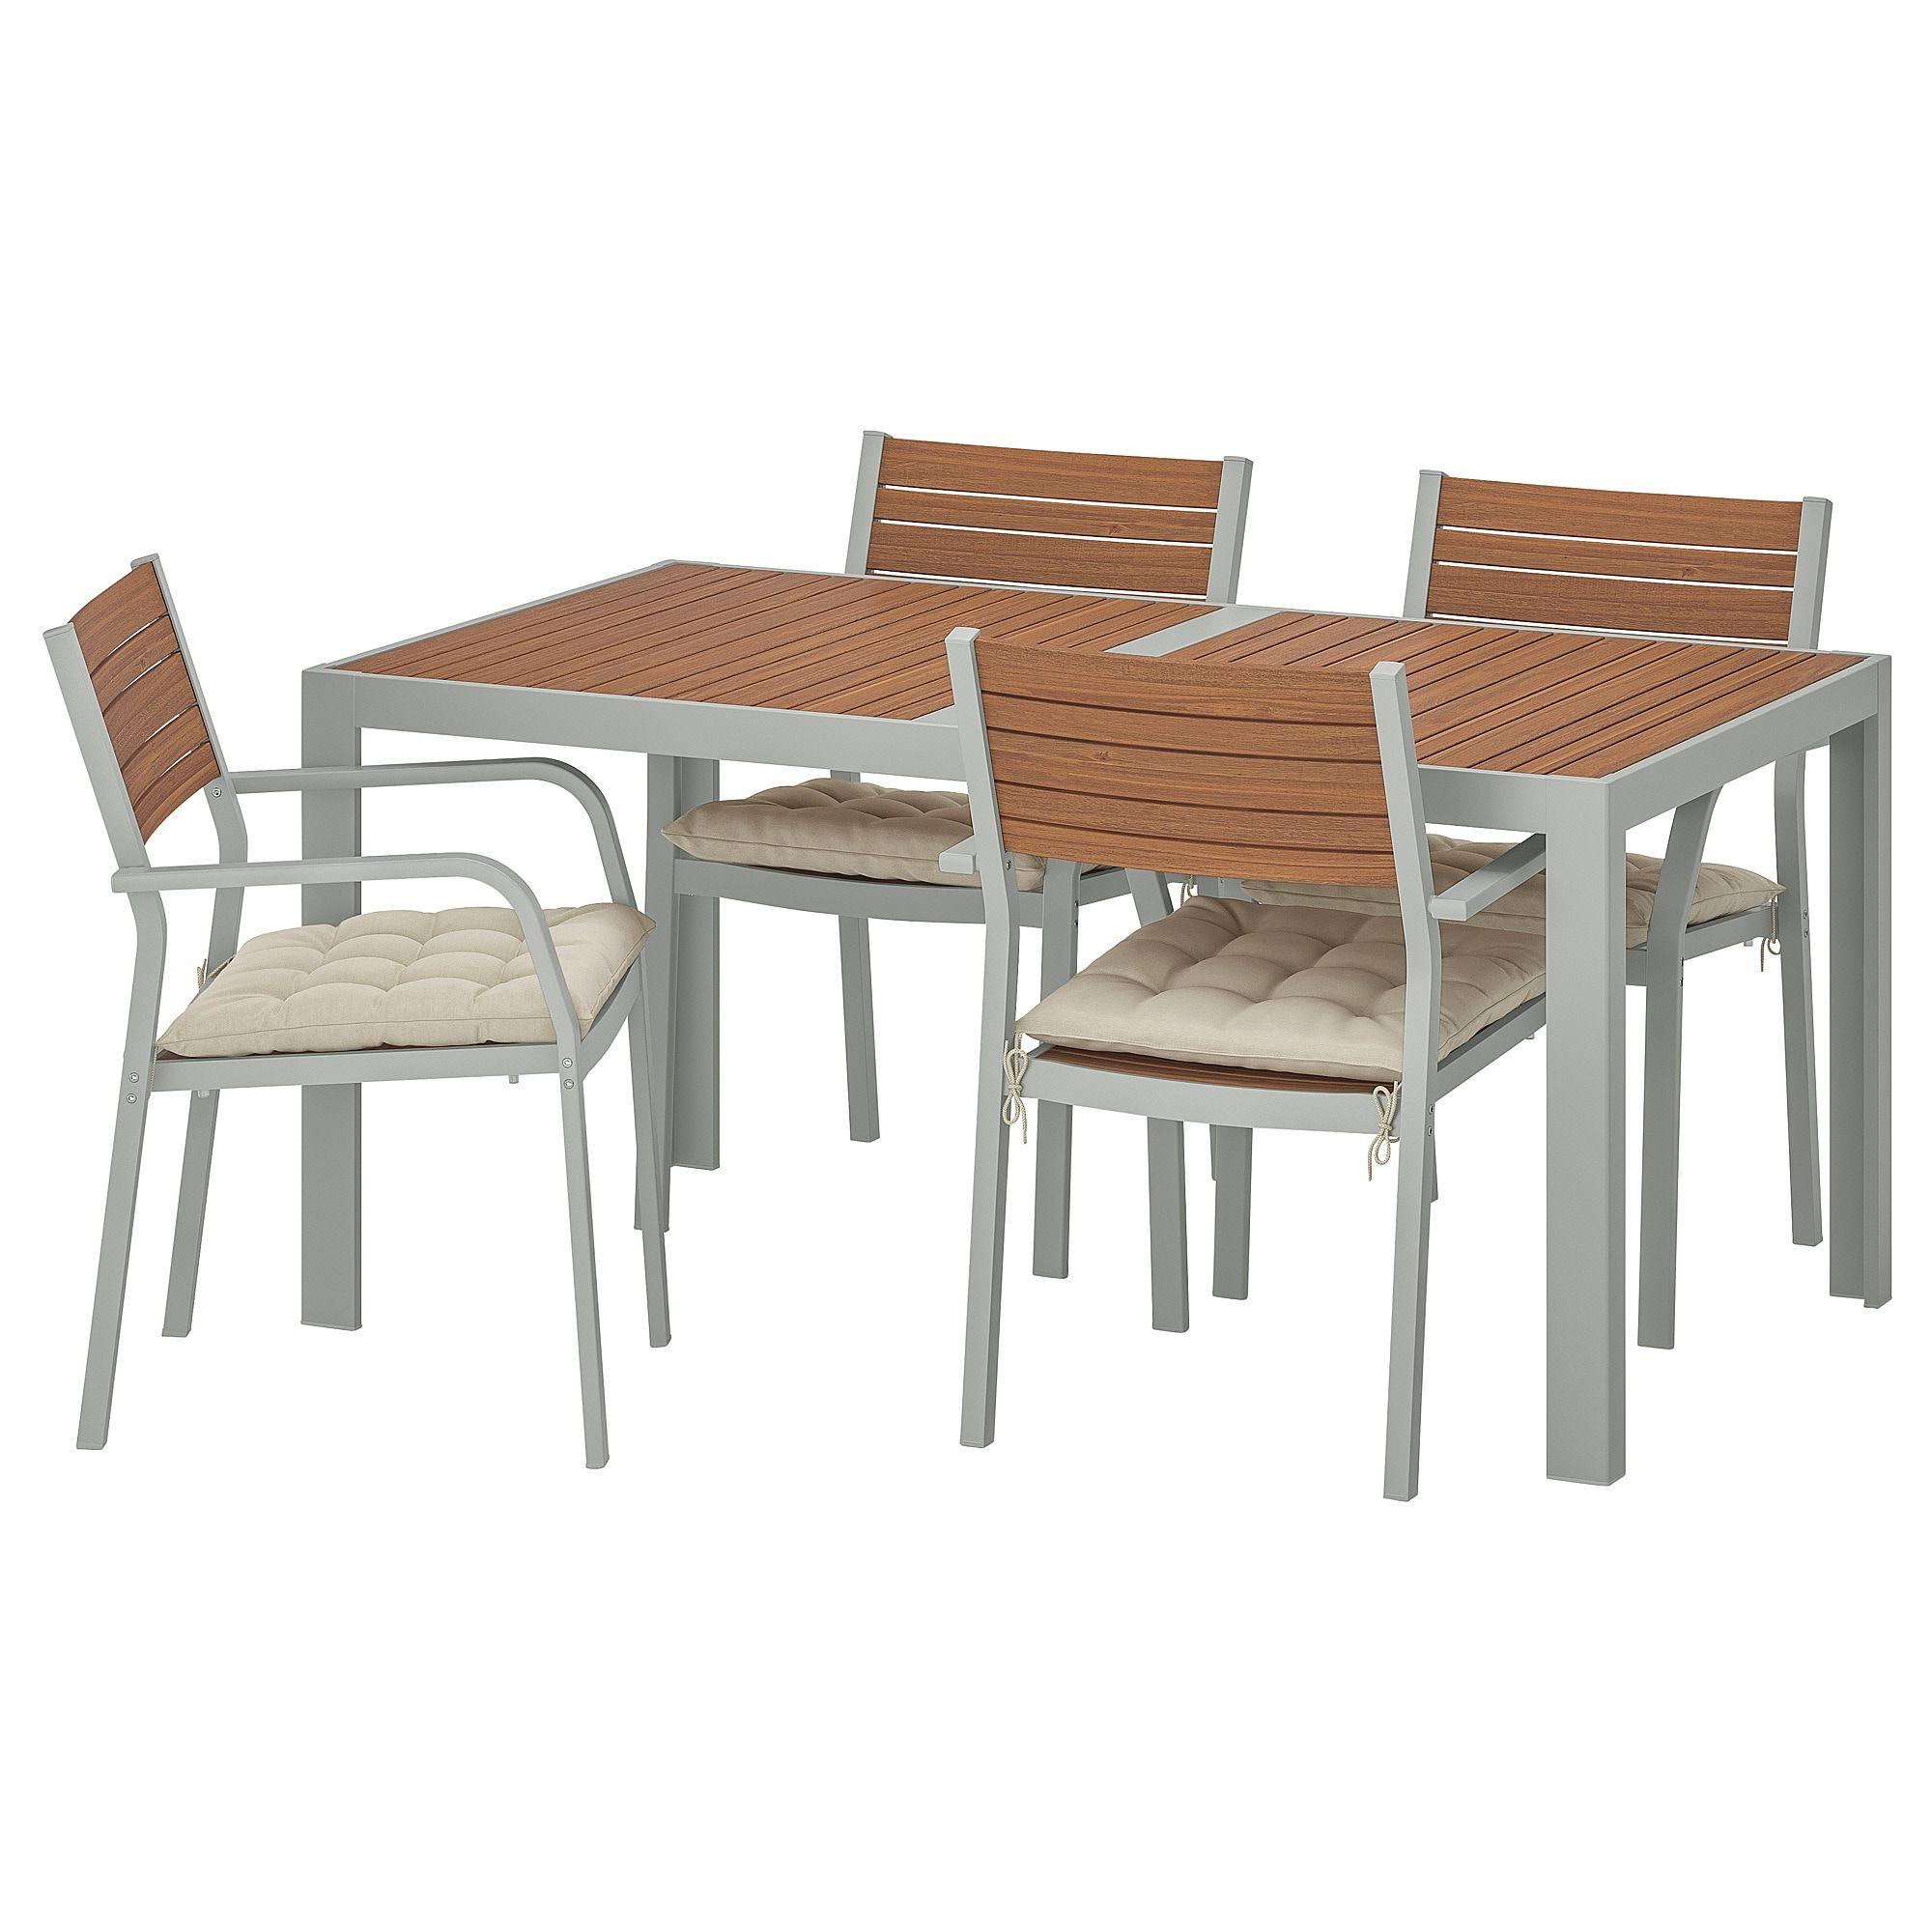 IKEA US Furniture and Home Furnishings | Furniture